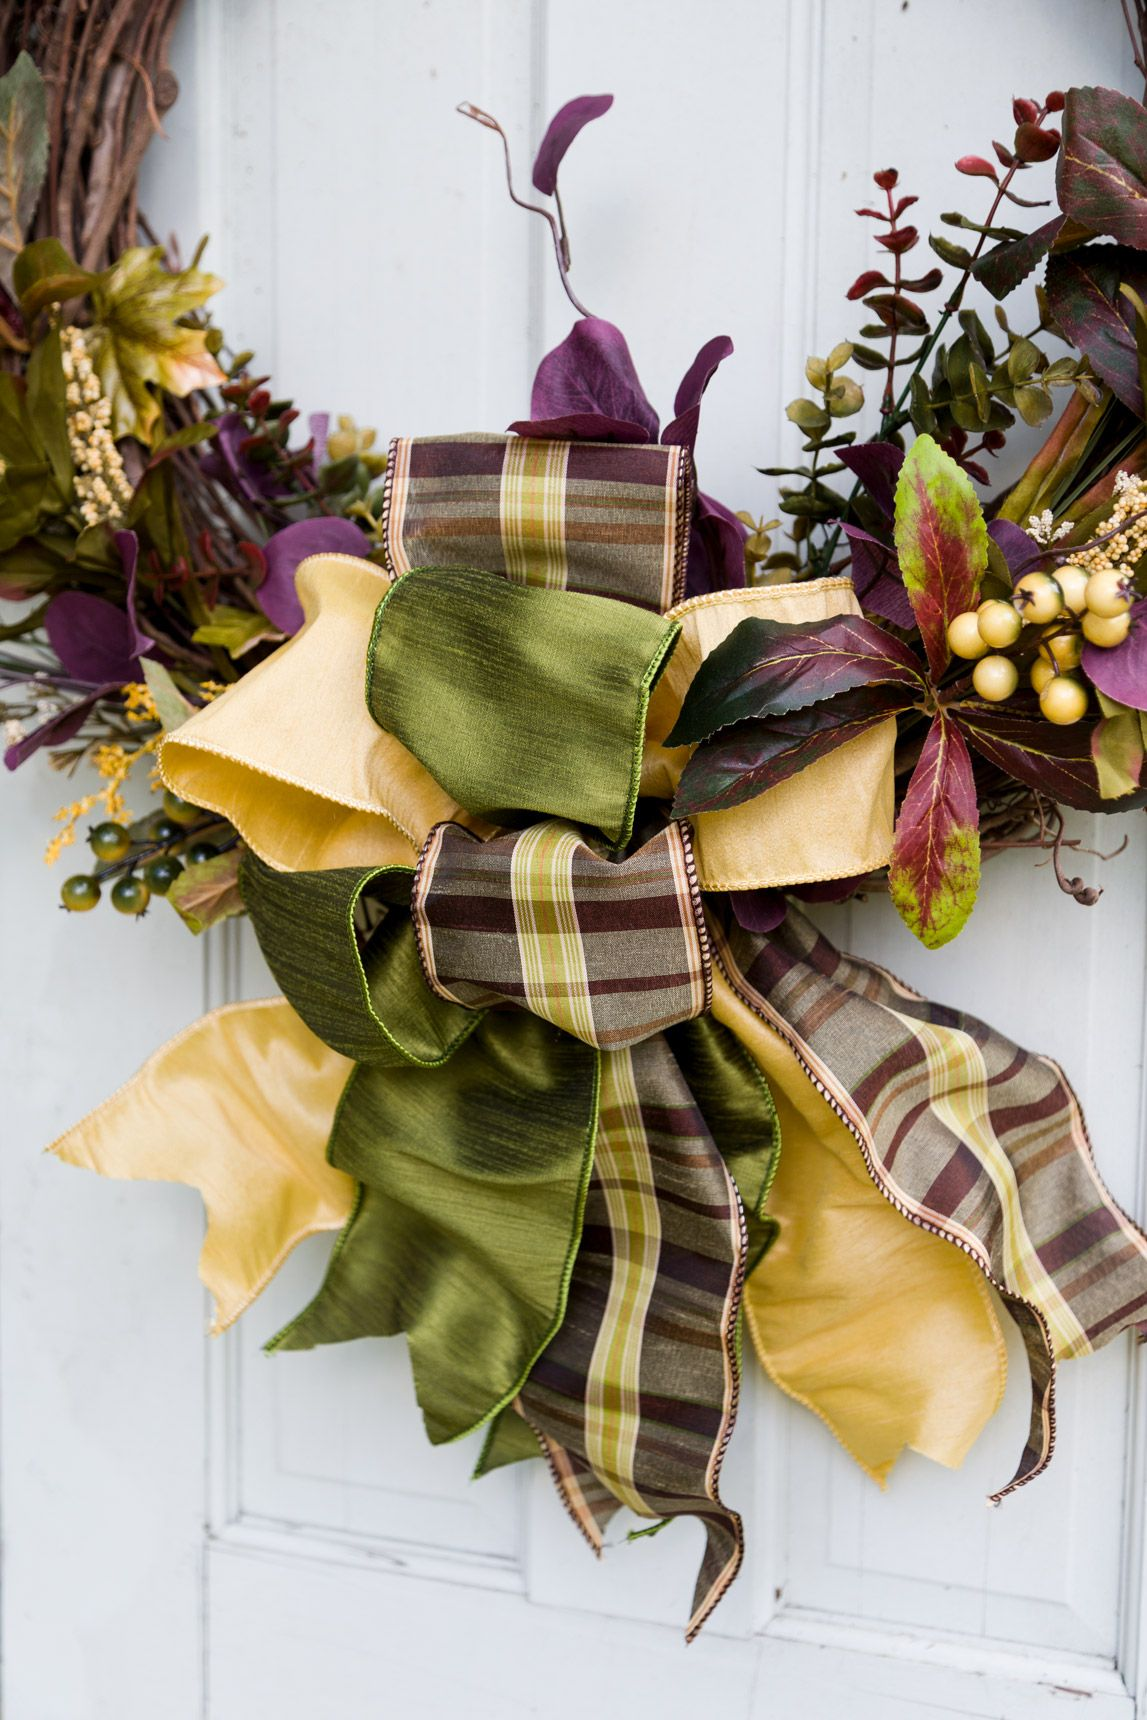 Elegant Fall Wreath DIY, Easy to Create Stunning Bows